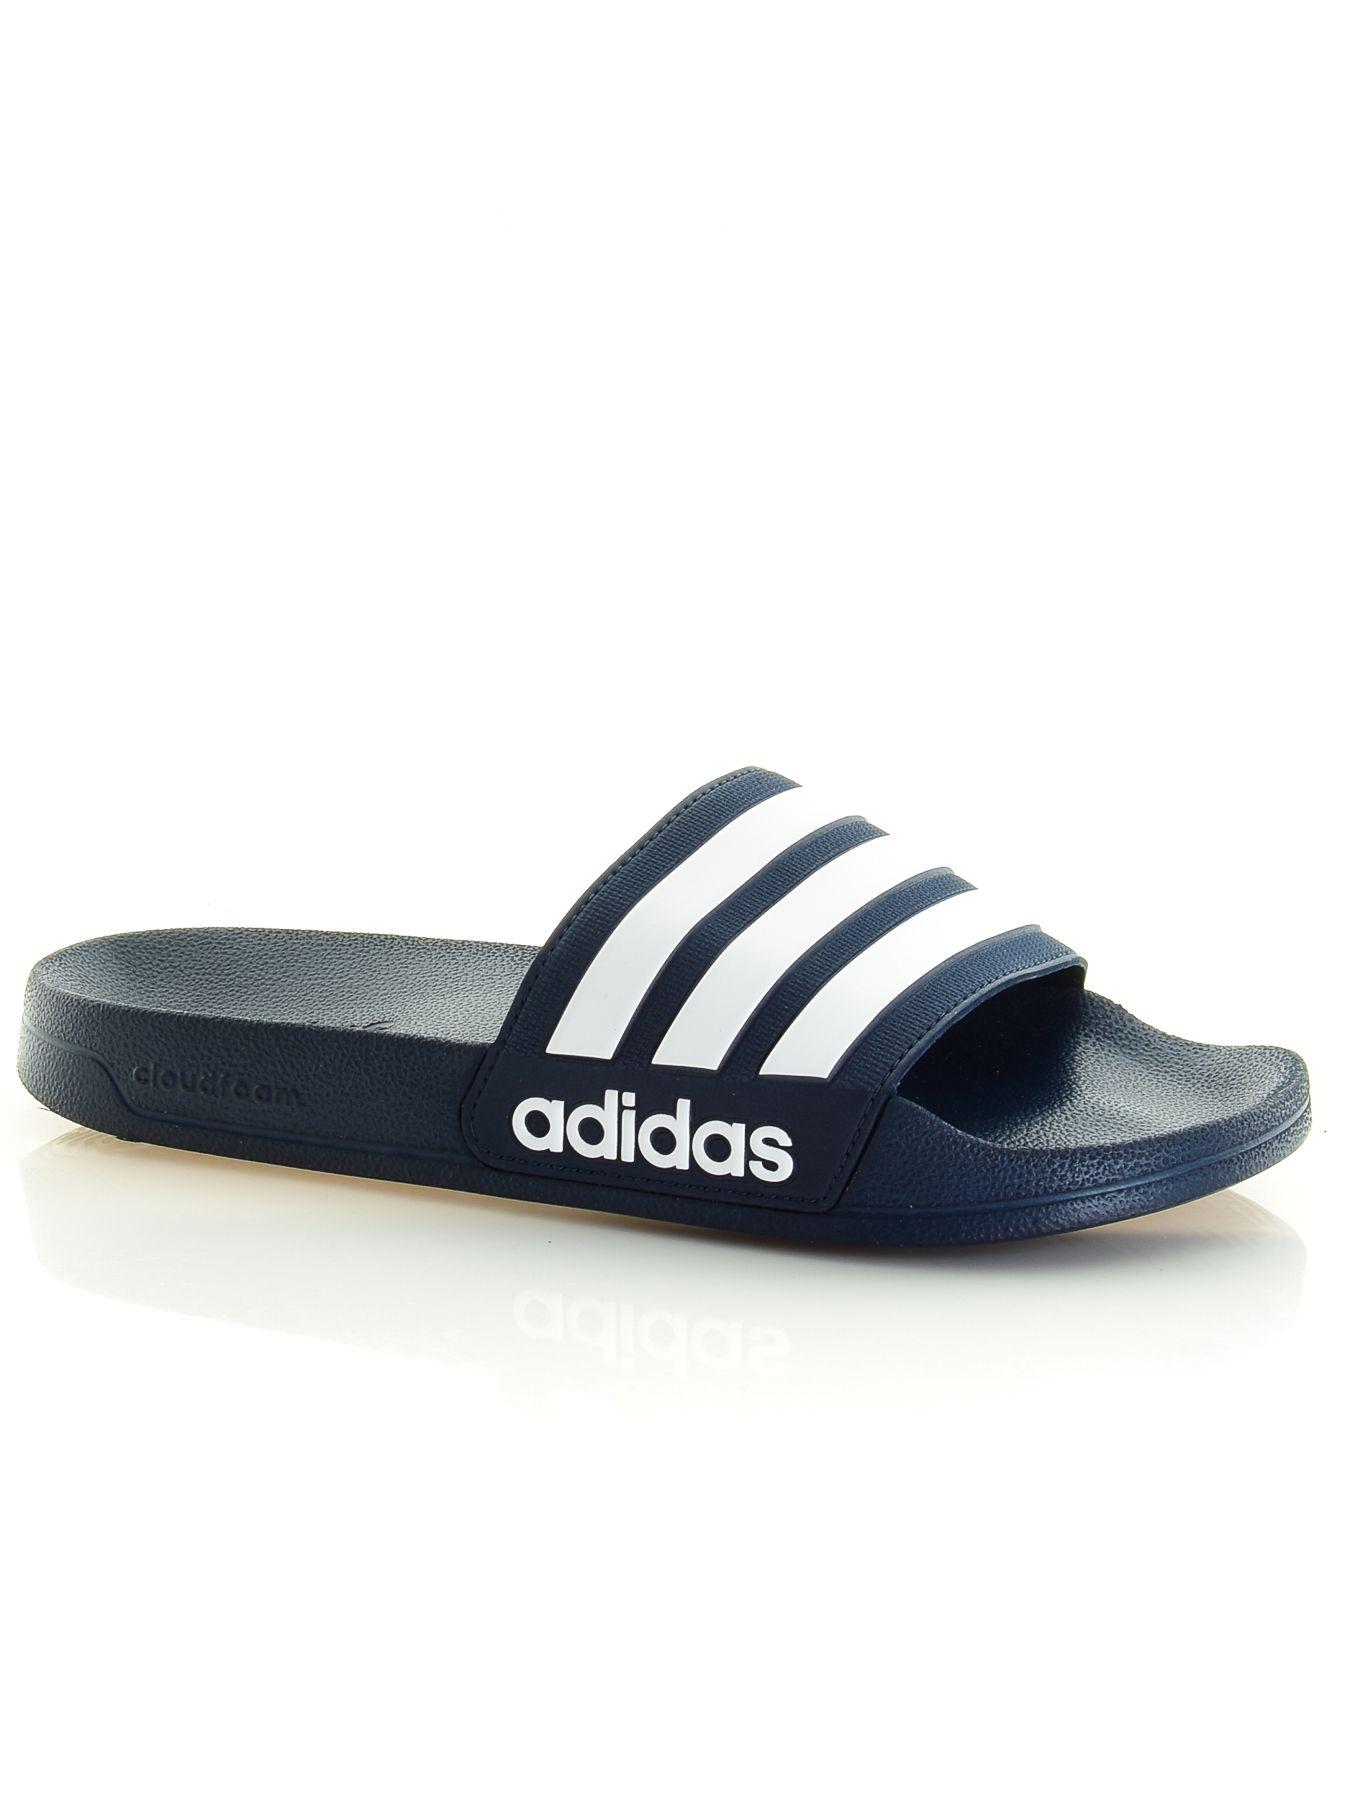 adidas Férfi Papucs Adilette Shower | Markasbolt.hu